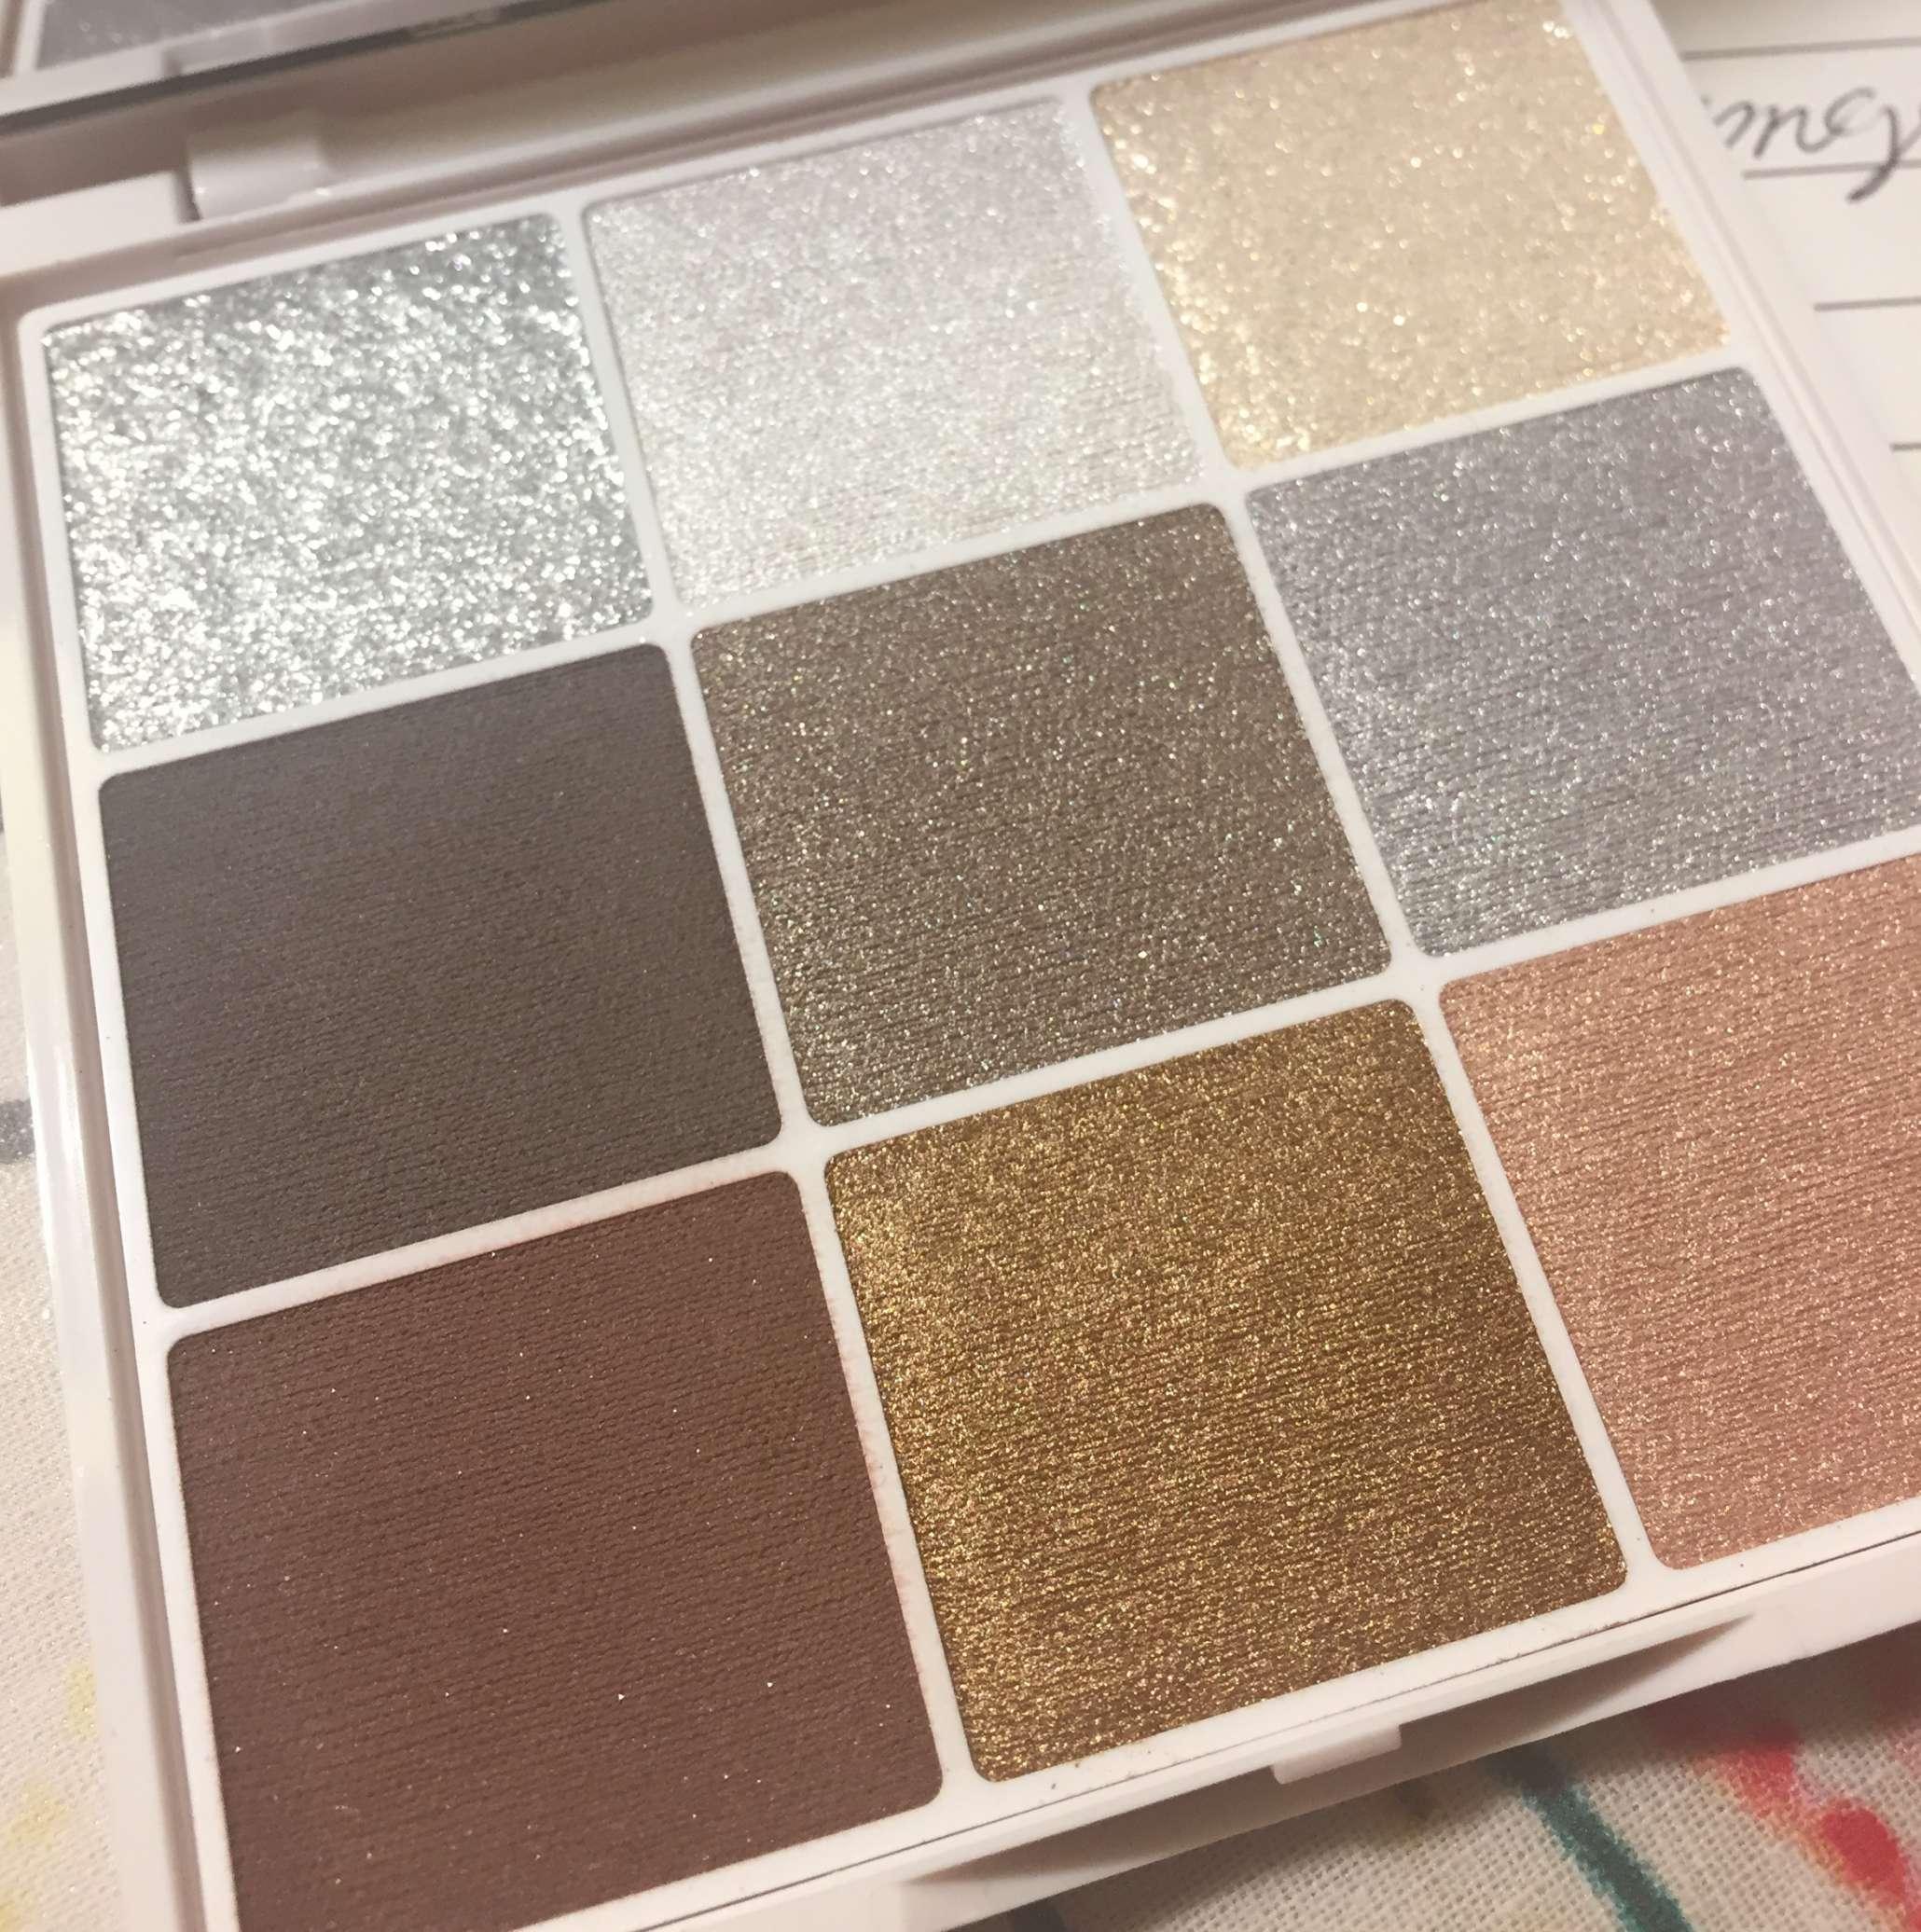 Eyeshadow, Øjenskyggepalette, Rituals, Rituals makeup, Palette,